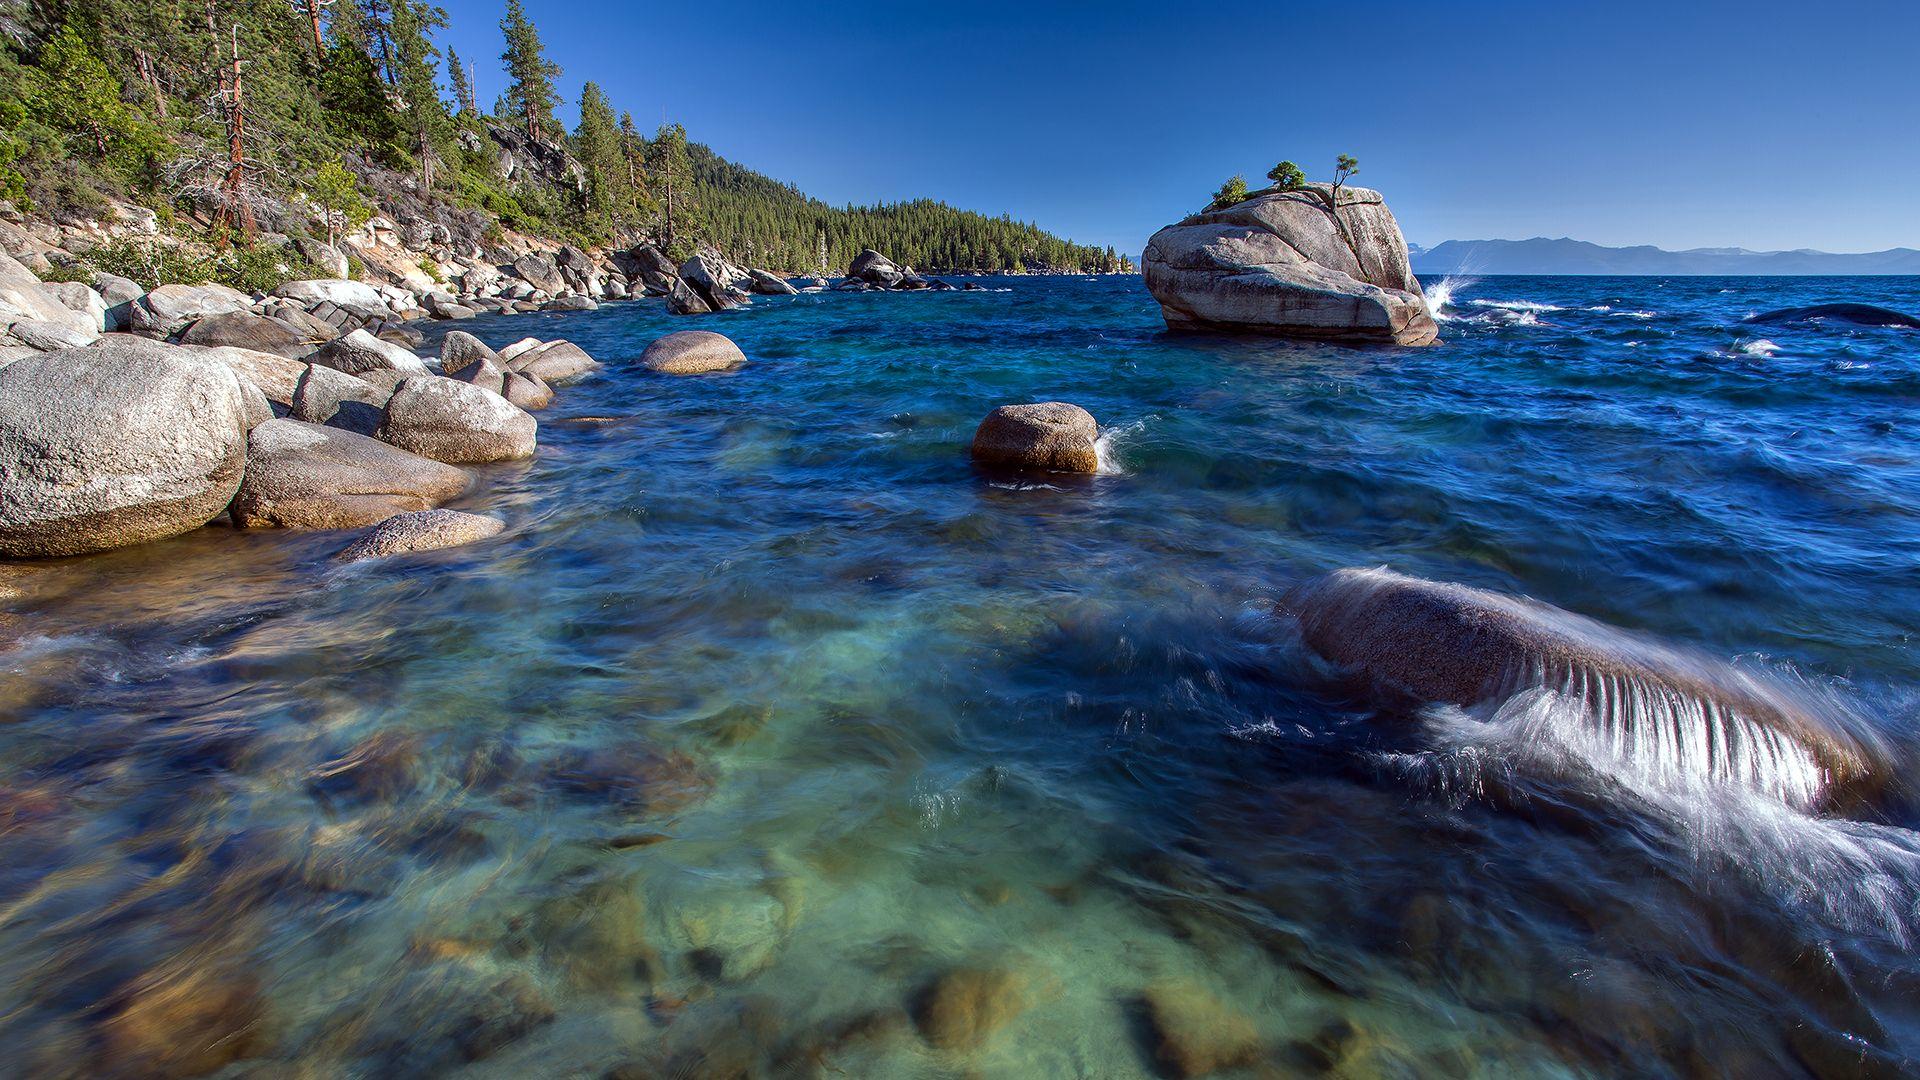 lake tahoe a· httpinterfacelift comwallpaper d47cd52303346 laketahoe 1920x1080